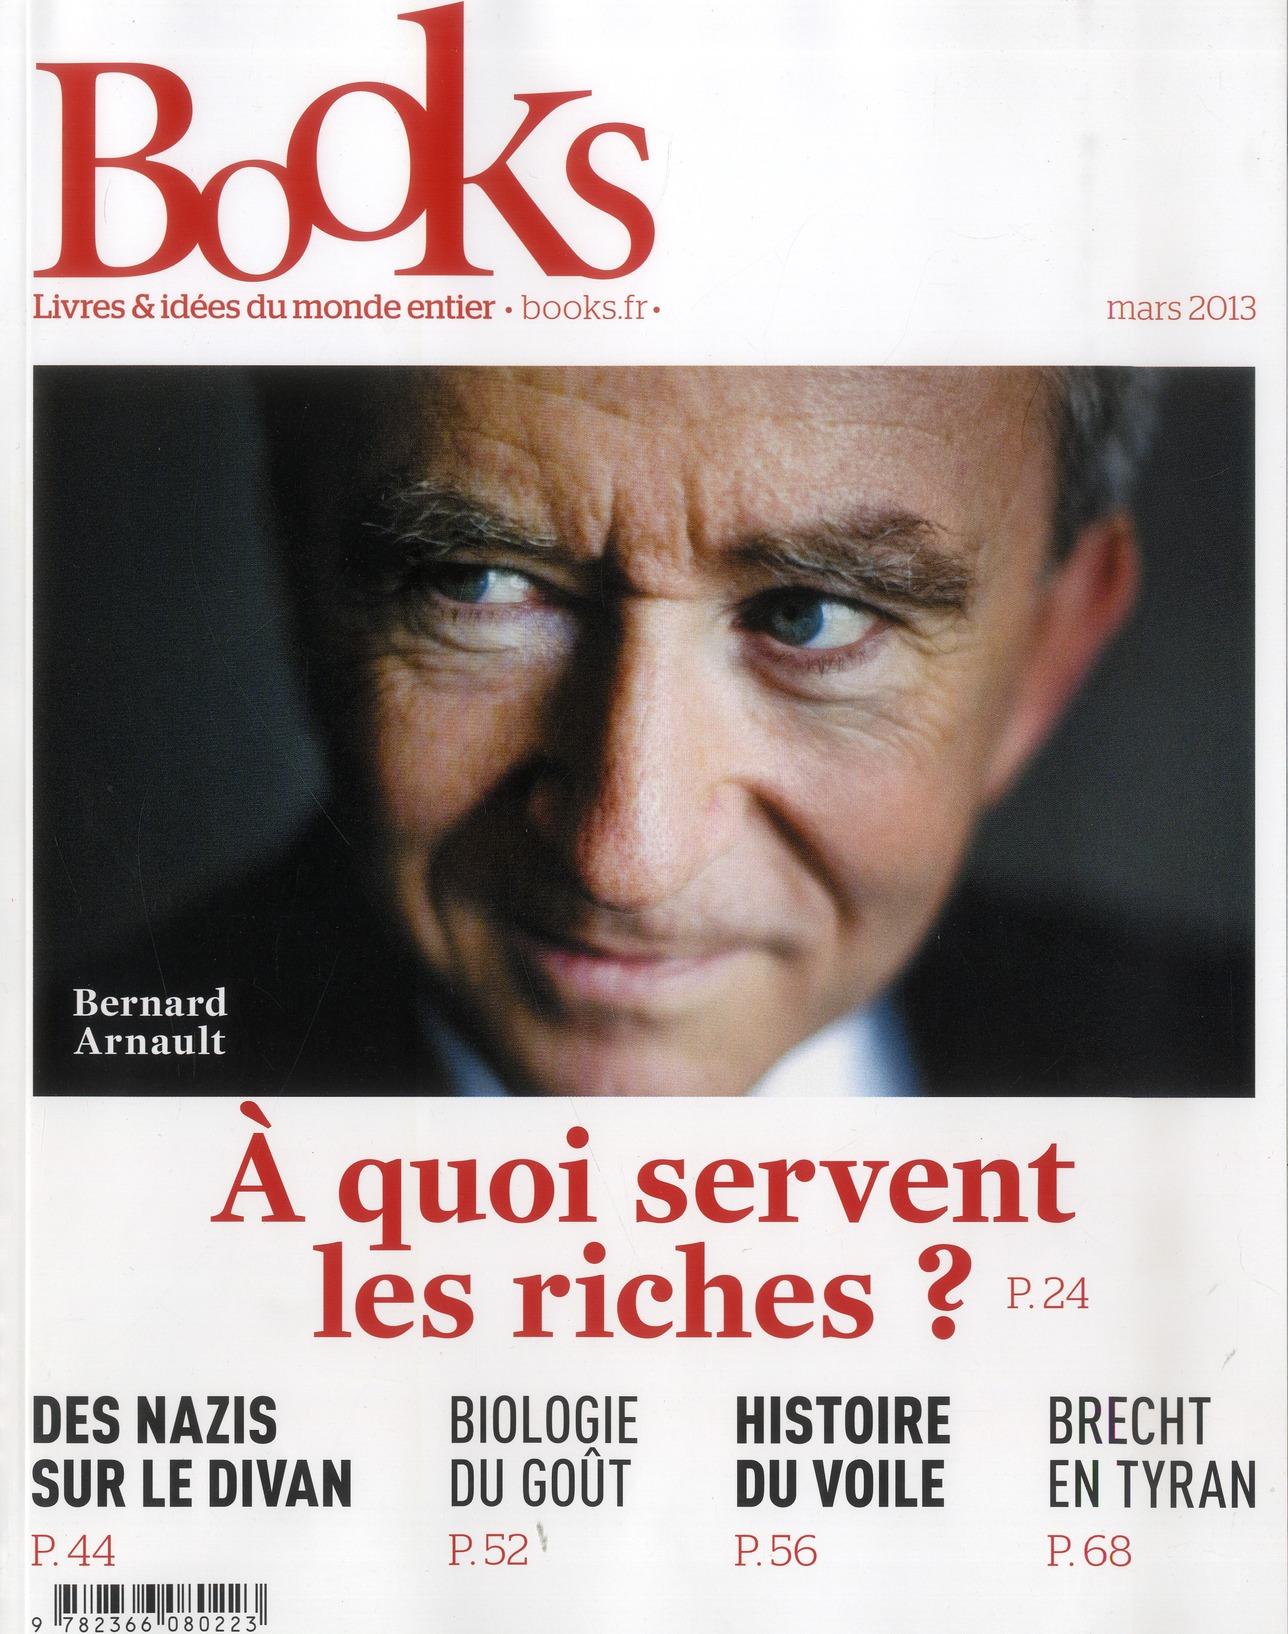 BOOKS N 41 MARS 2013